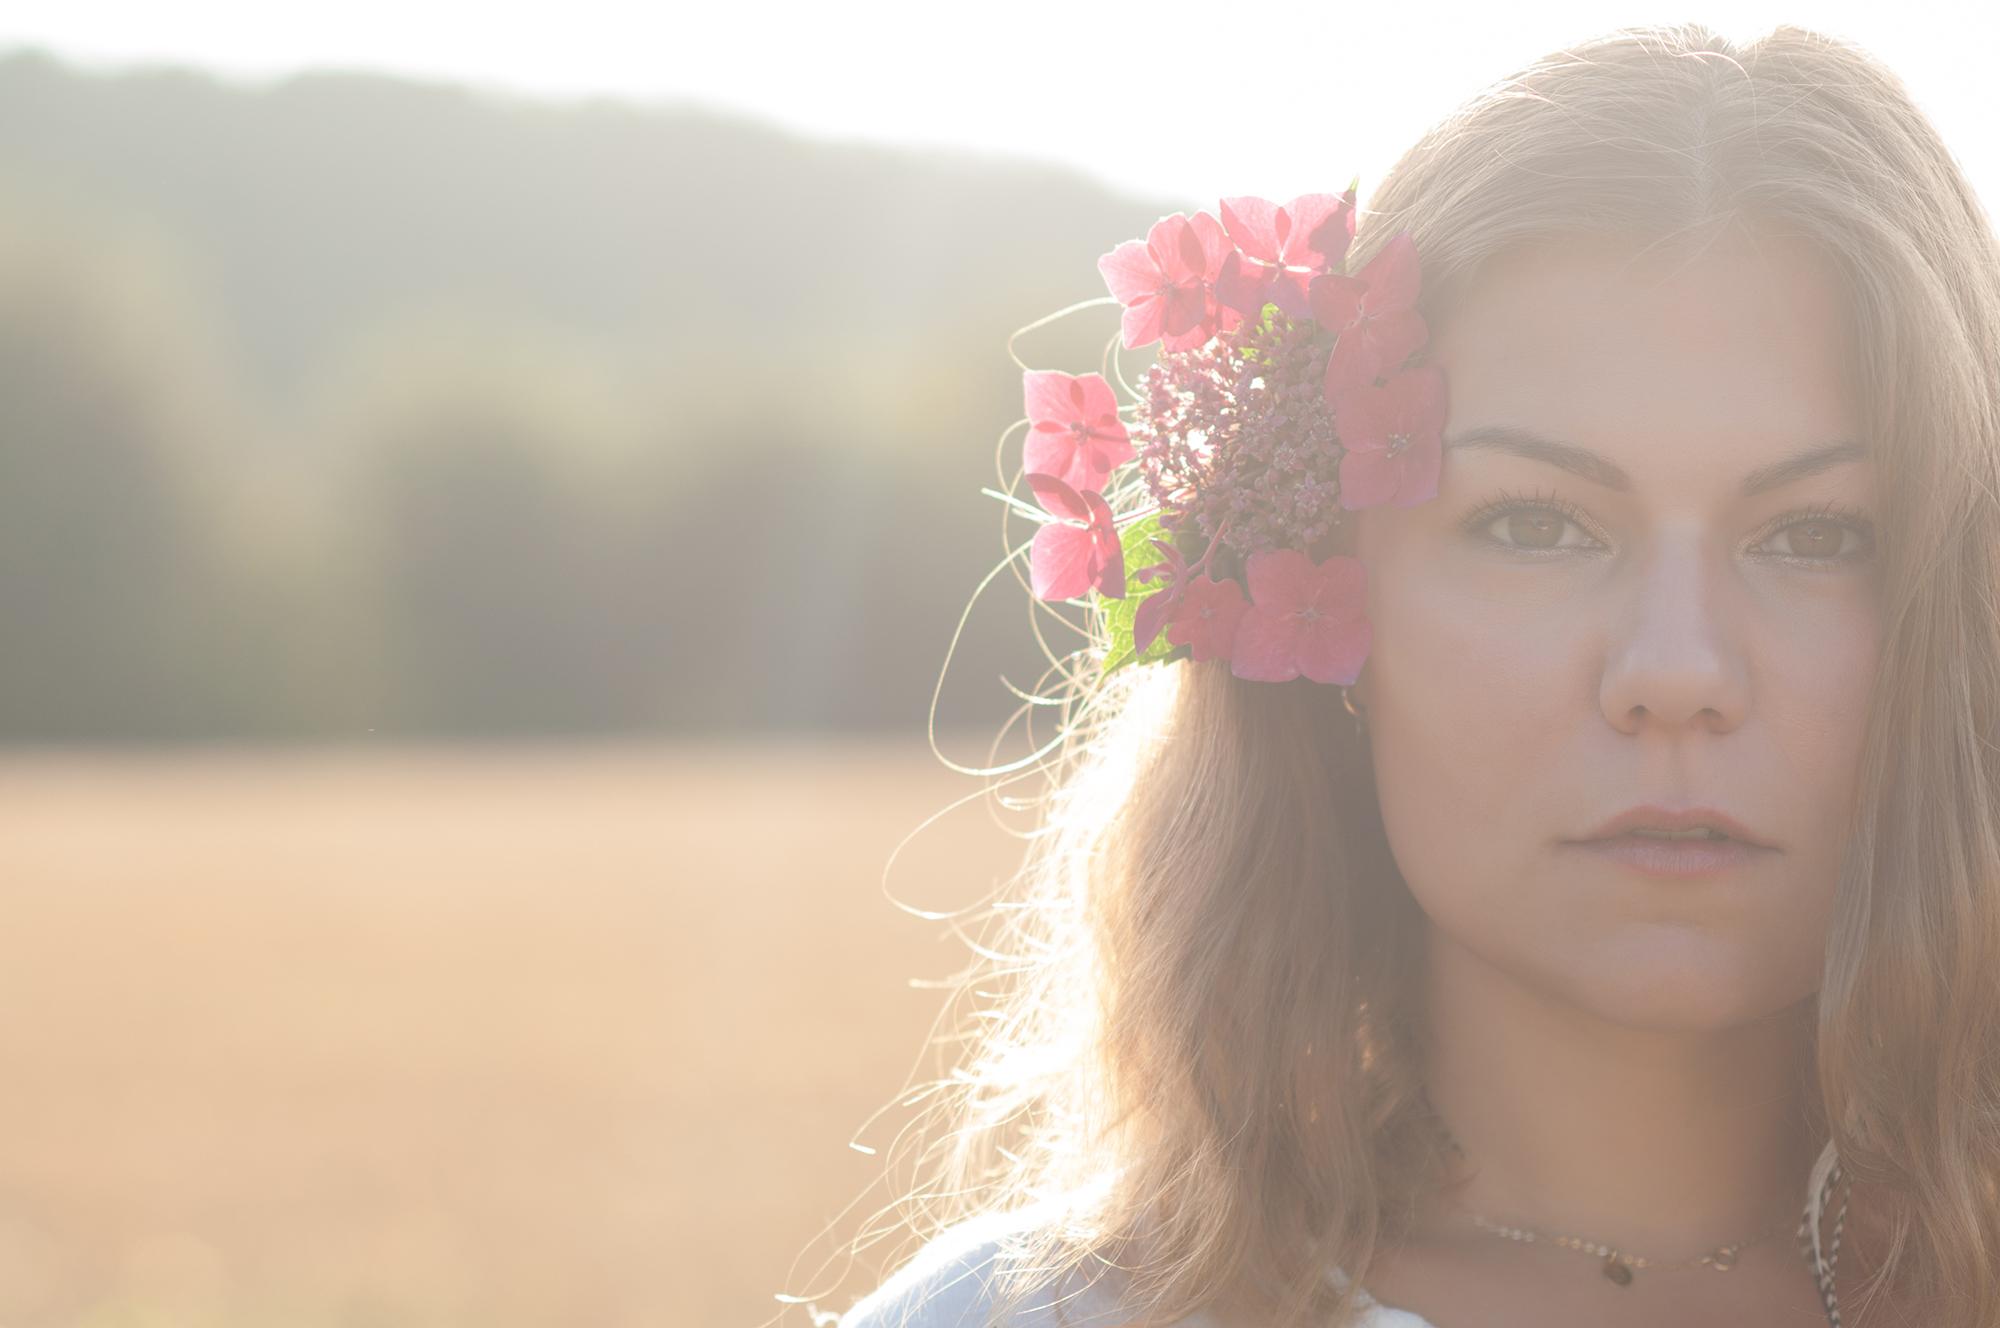 laura-coker-photography-2015-golden-hour-dreamy-shoot_7